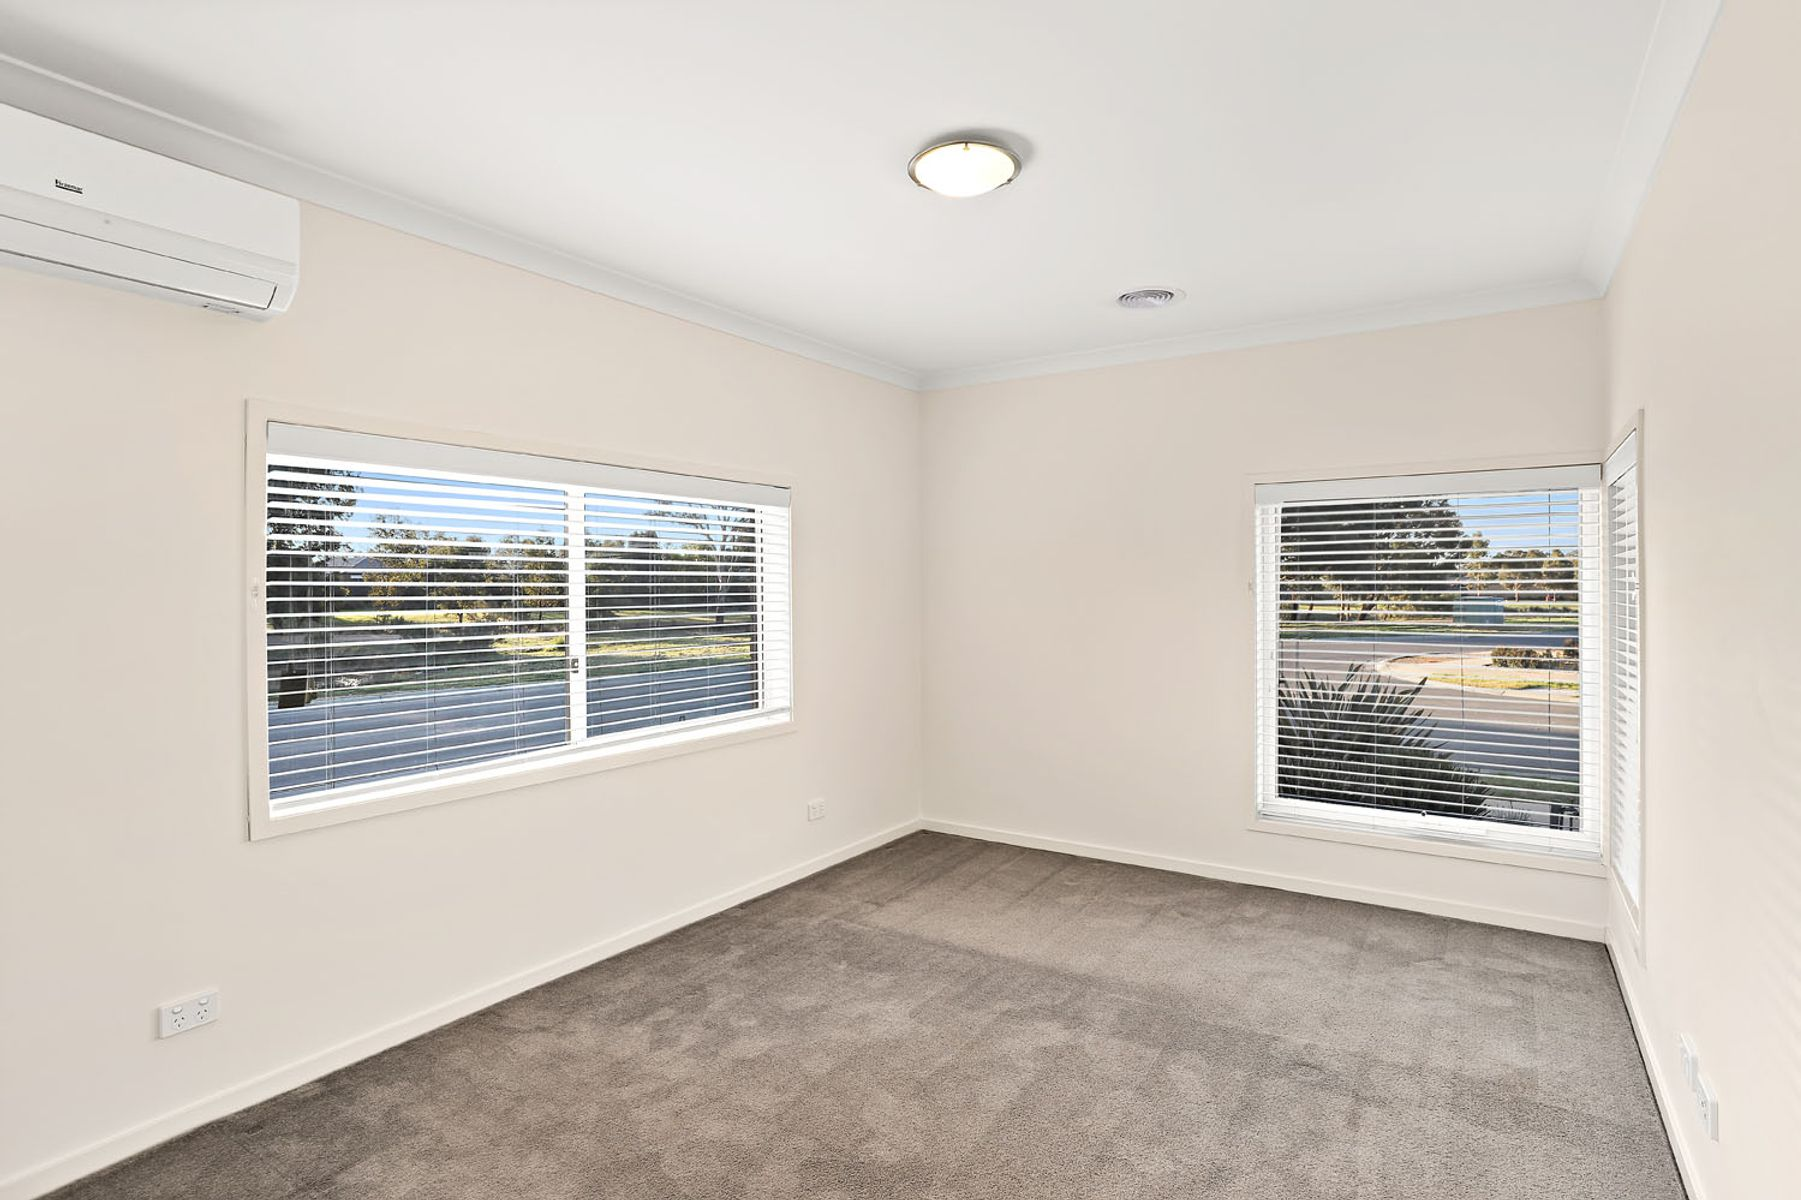 2 Eucalyptus st, Jackass Flat, VIC 3556